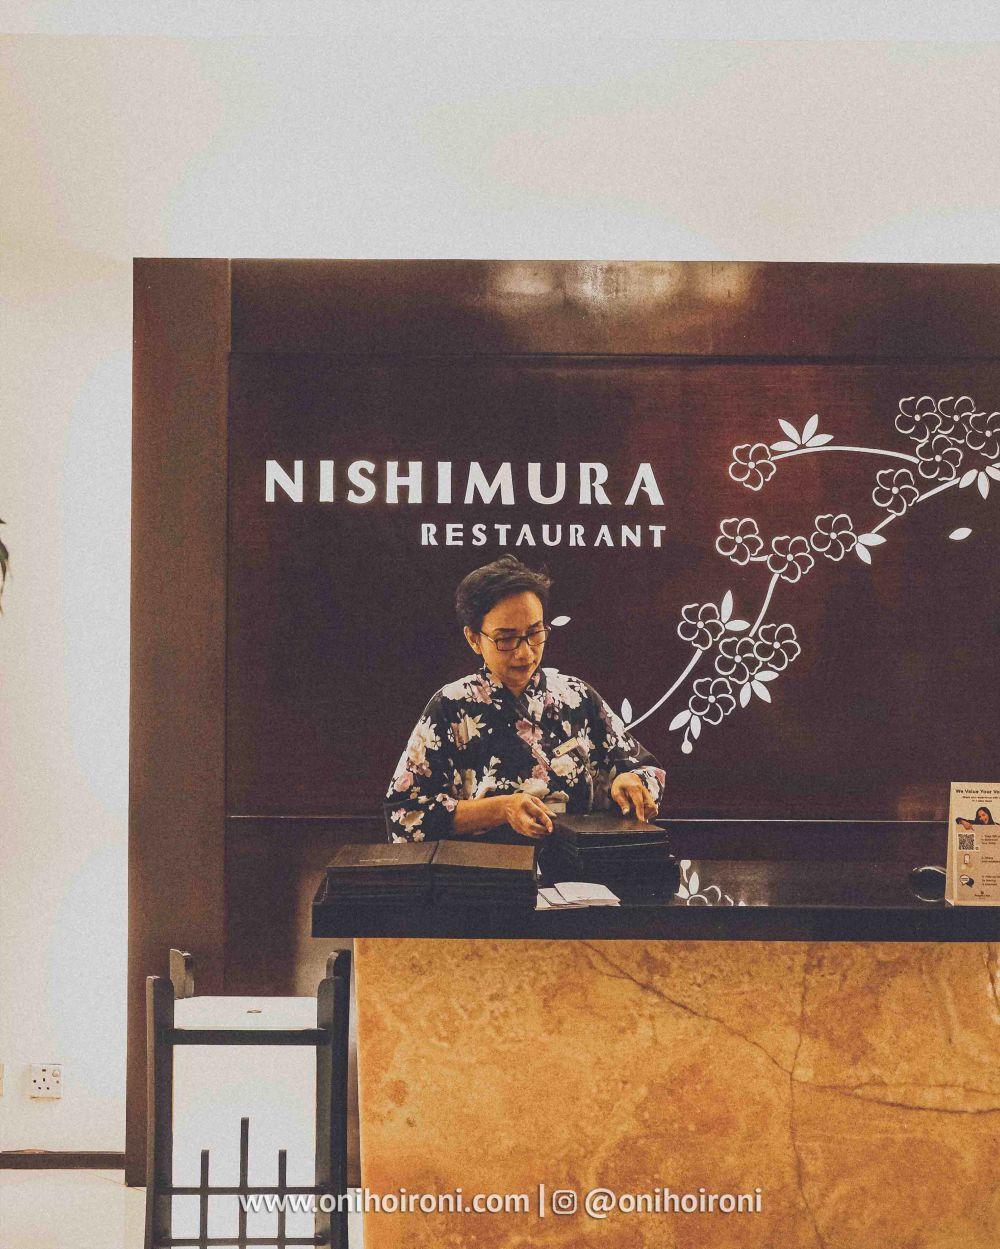 4 Review food makanan Nishimura restaurant Shangrila Surabaya Hotel Oni hoironi